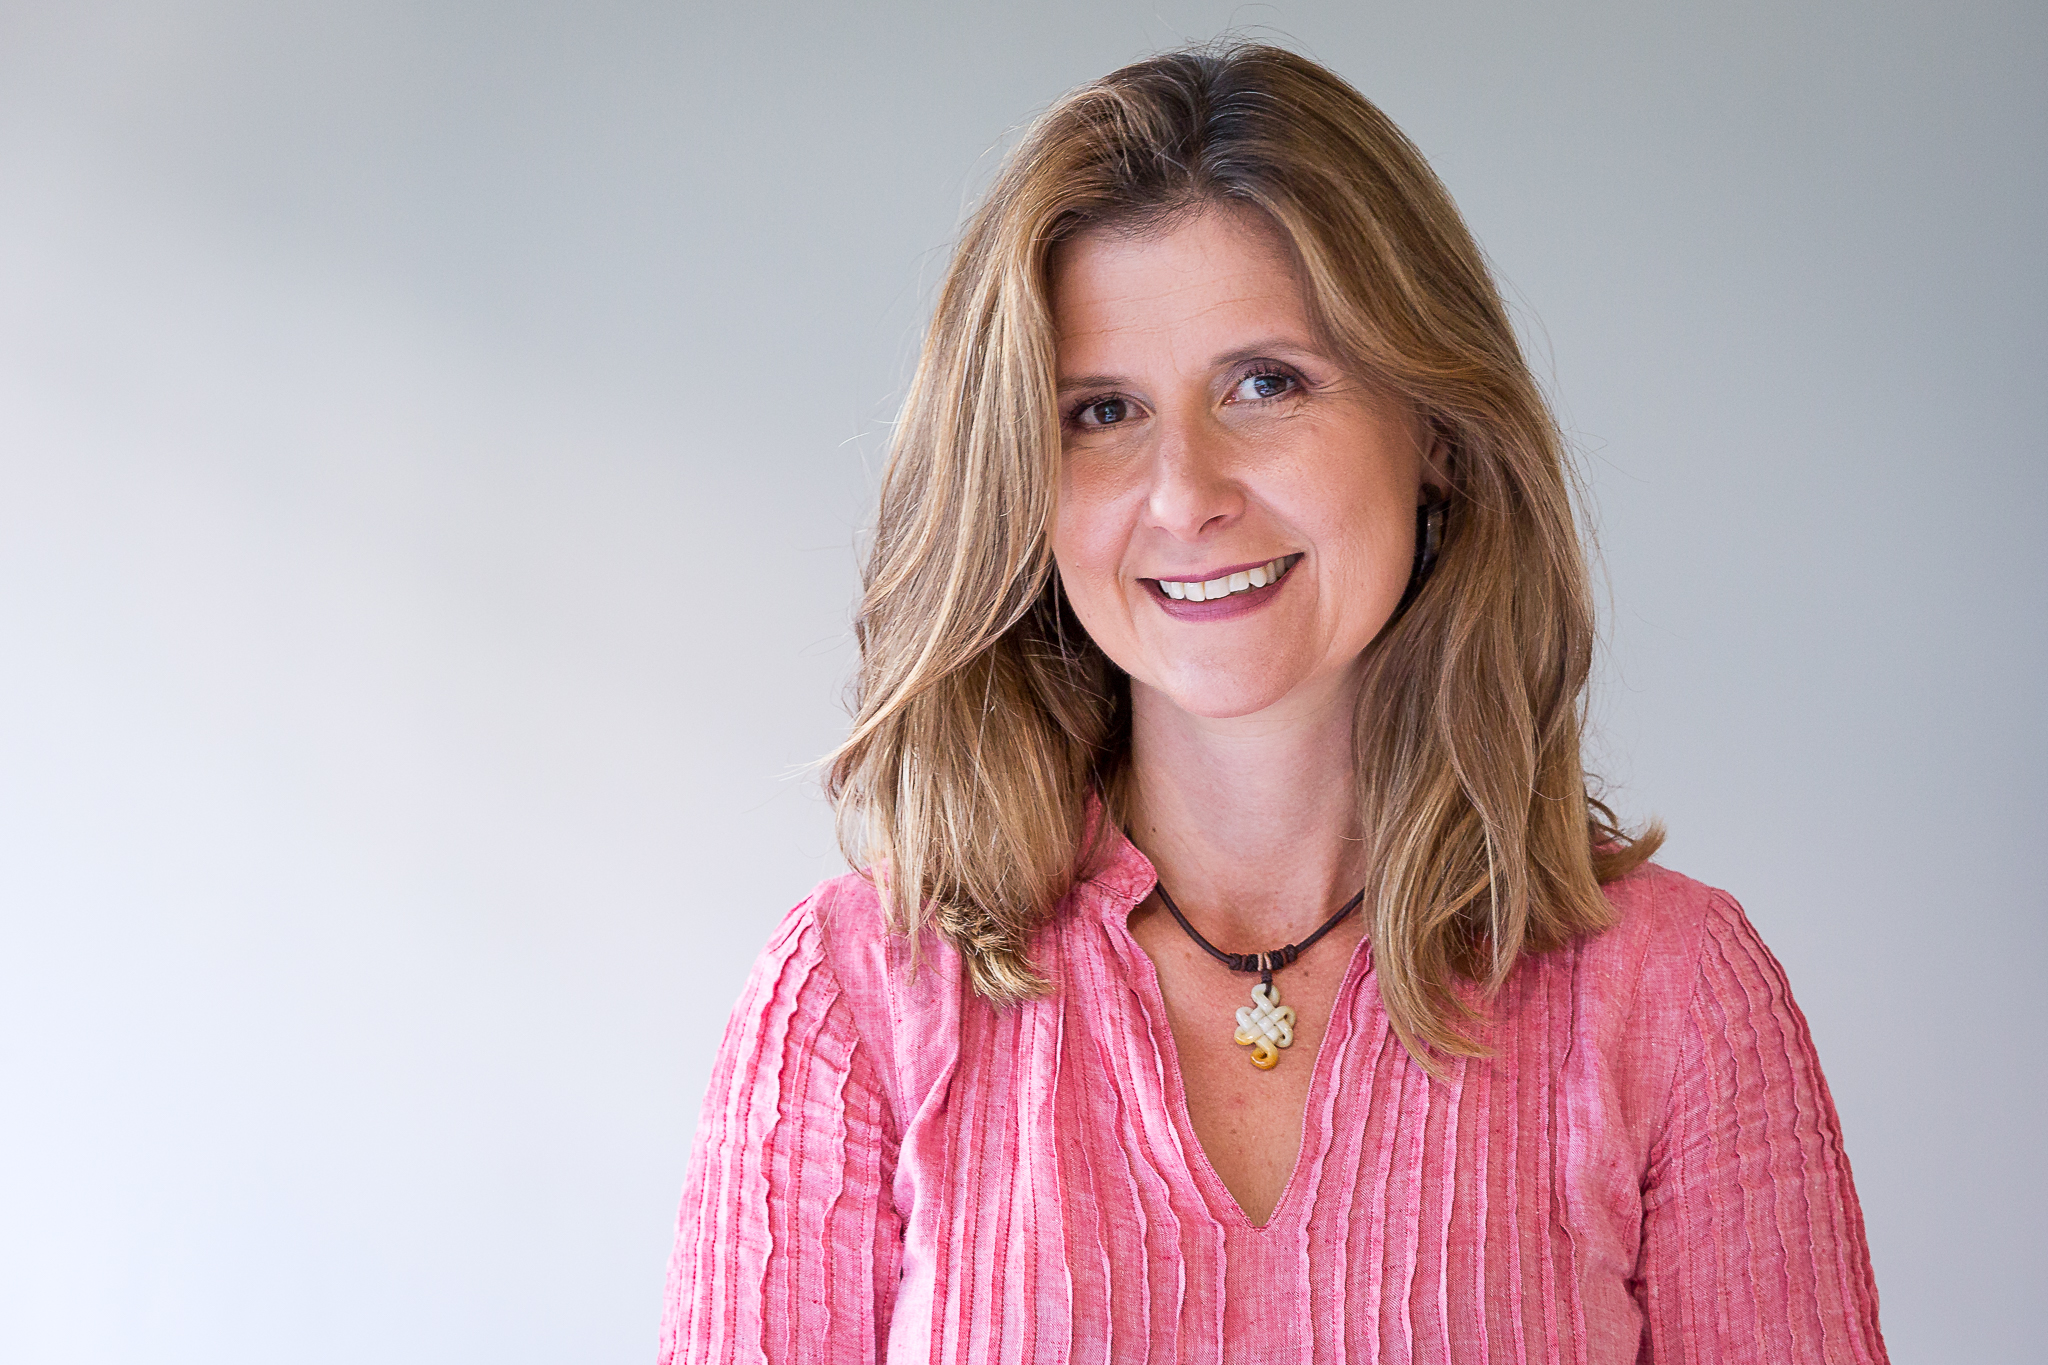 Cristina Campos Silva, mãe de duas entusiastas alunas e franchisada do Centro Helen Doron English Porto-Foz